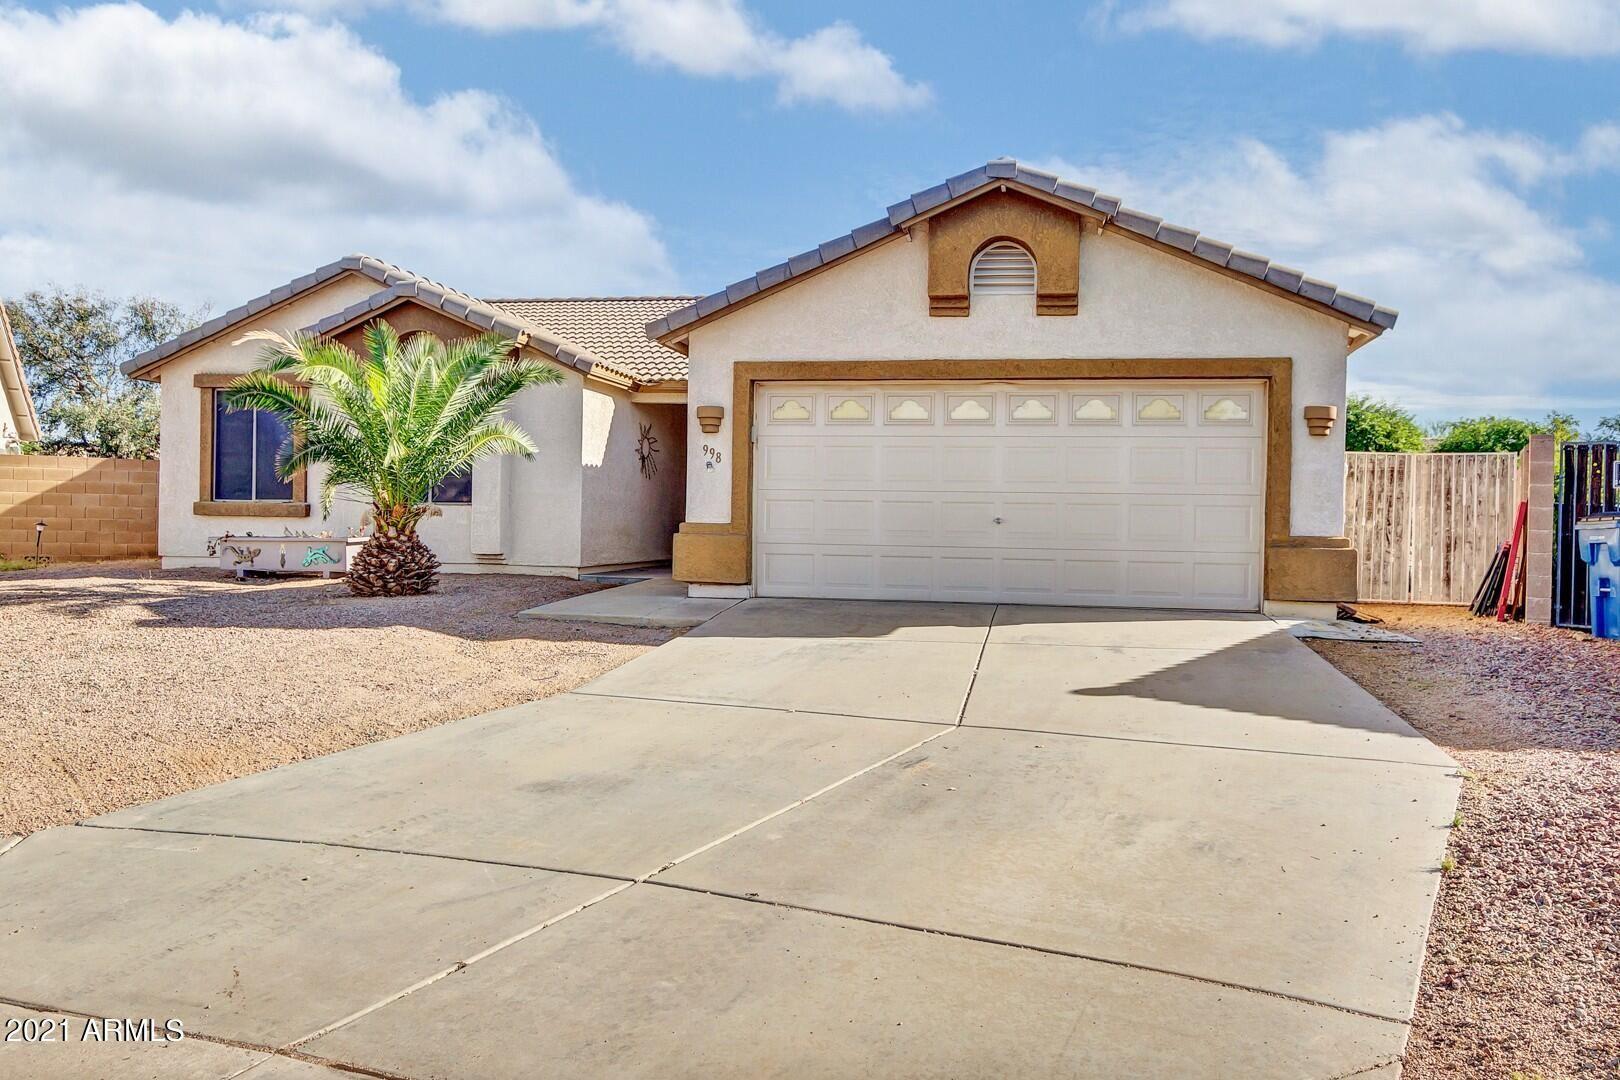 Photo of 998 W ROSAL Avenue, Apache Junction, AZ 85120 (MLS # 6300857)